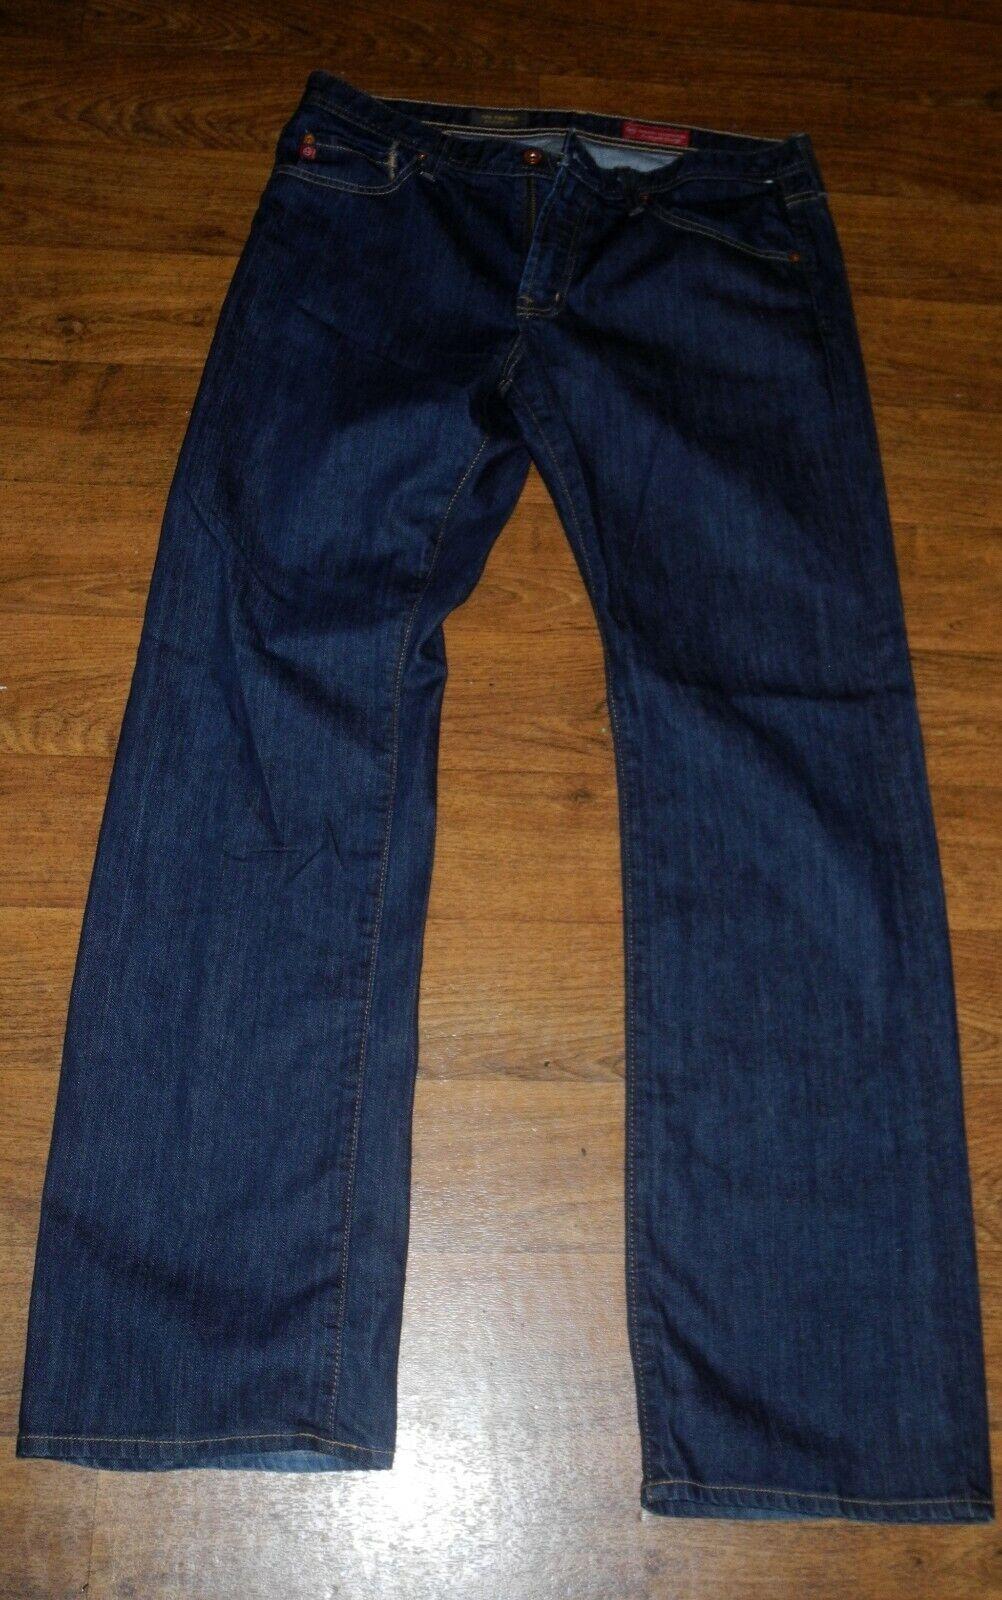 AG Adriano goldschmied PredEGE Straight Leg Men's Dark bluee Jeans 33x34